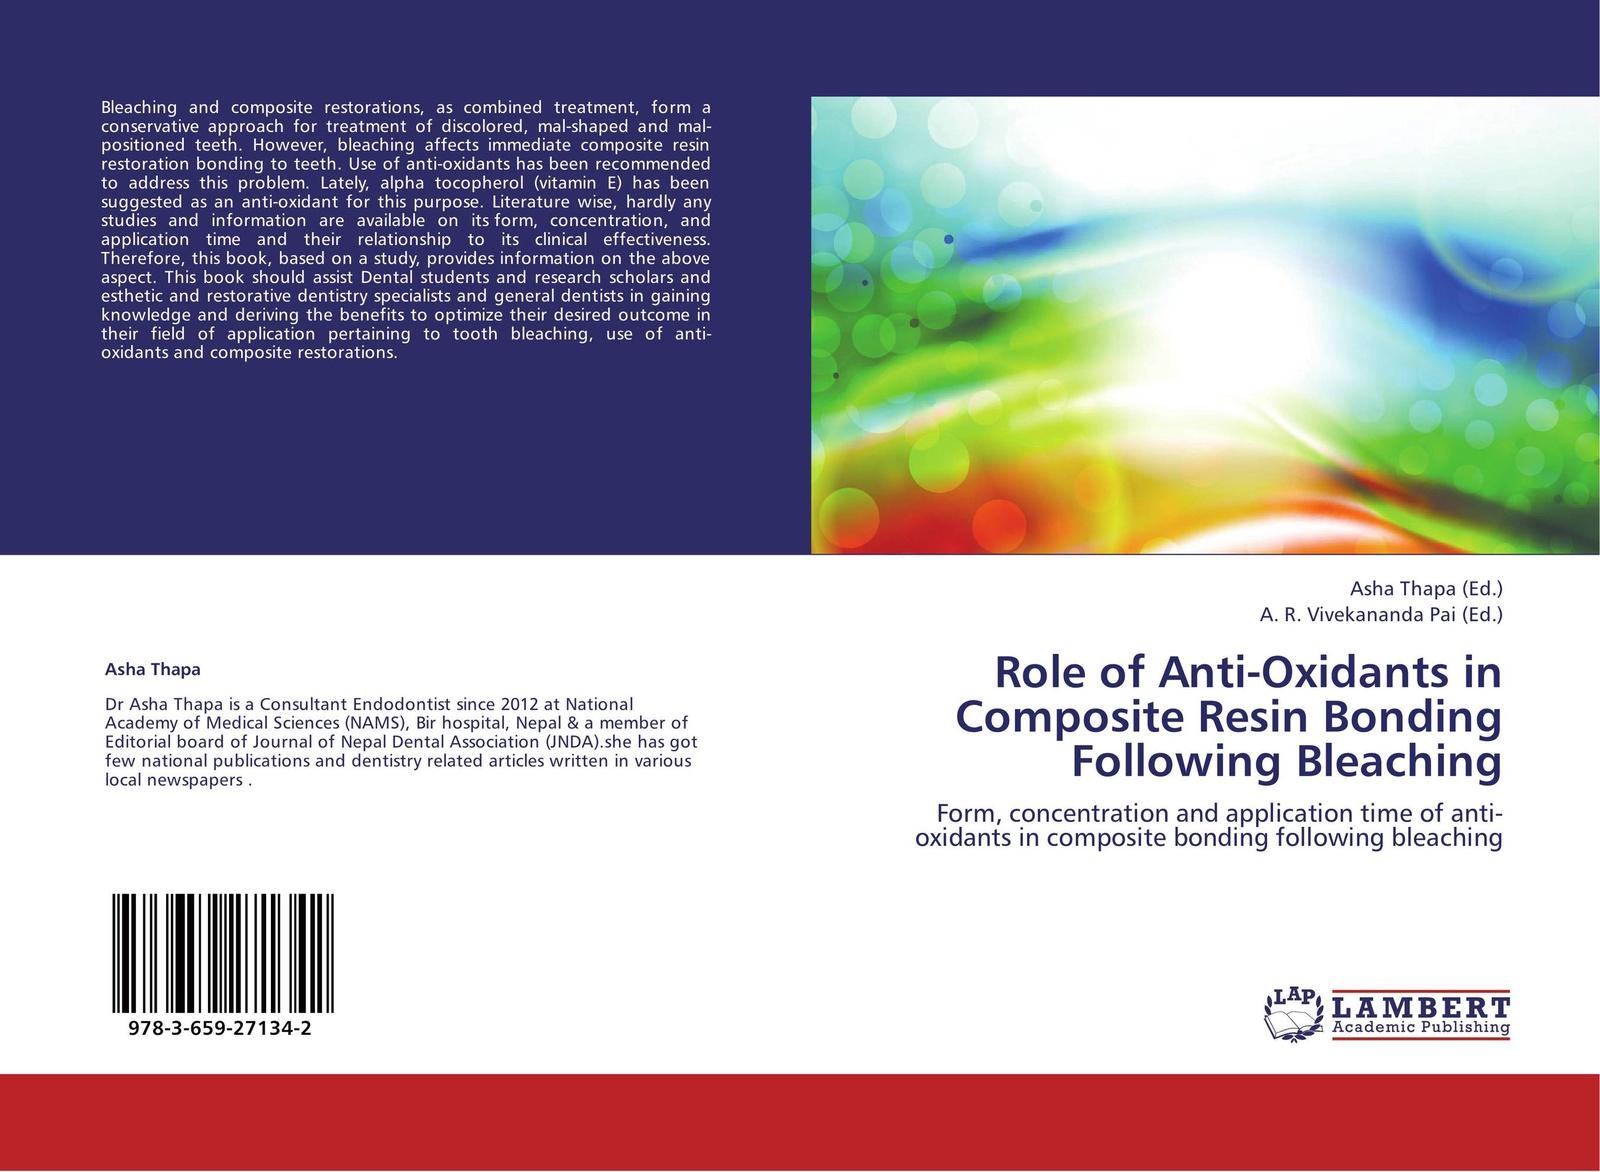 Asha Thapa and A. R. Vivekananda Pai Role of Anti-Oxidants in Composite Resin Bonding Following Bleaching